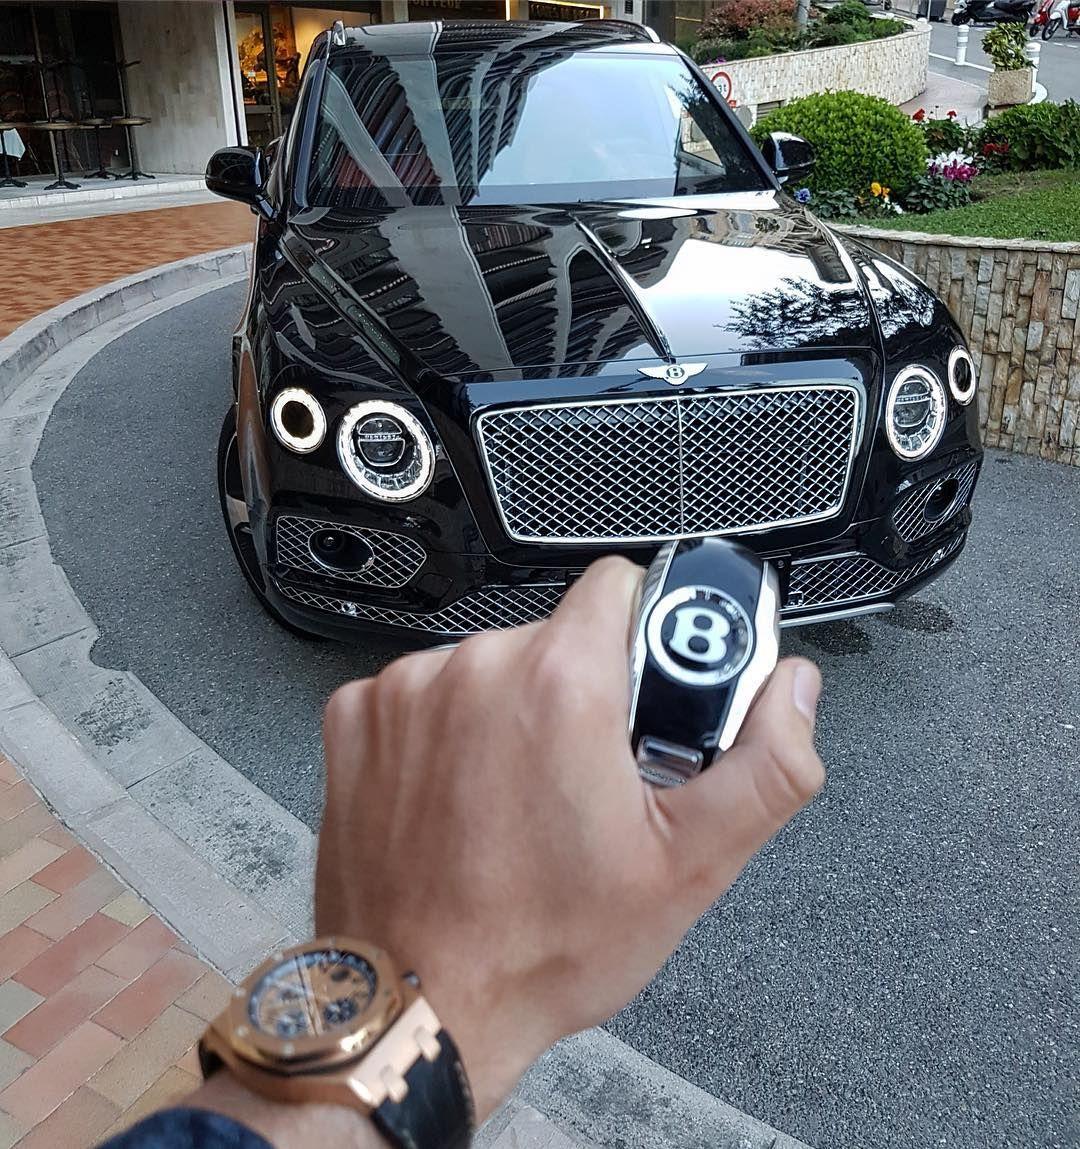 High End Luxury Cars Audi: Gmk001 Supercars Mercedes Bently Audi Porsche Luxury Watch